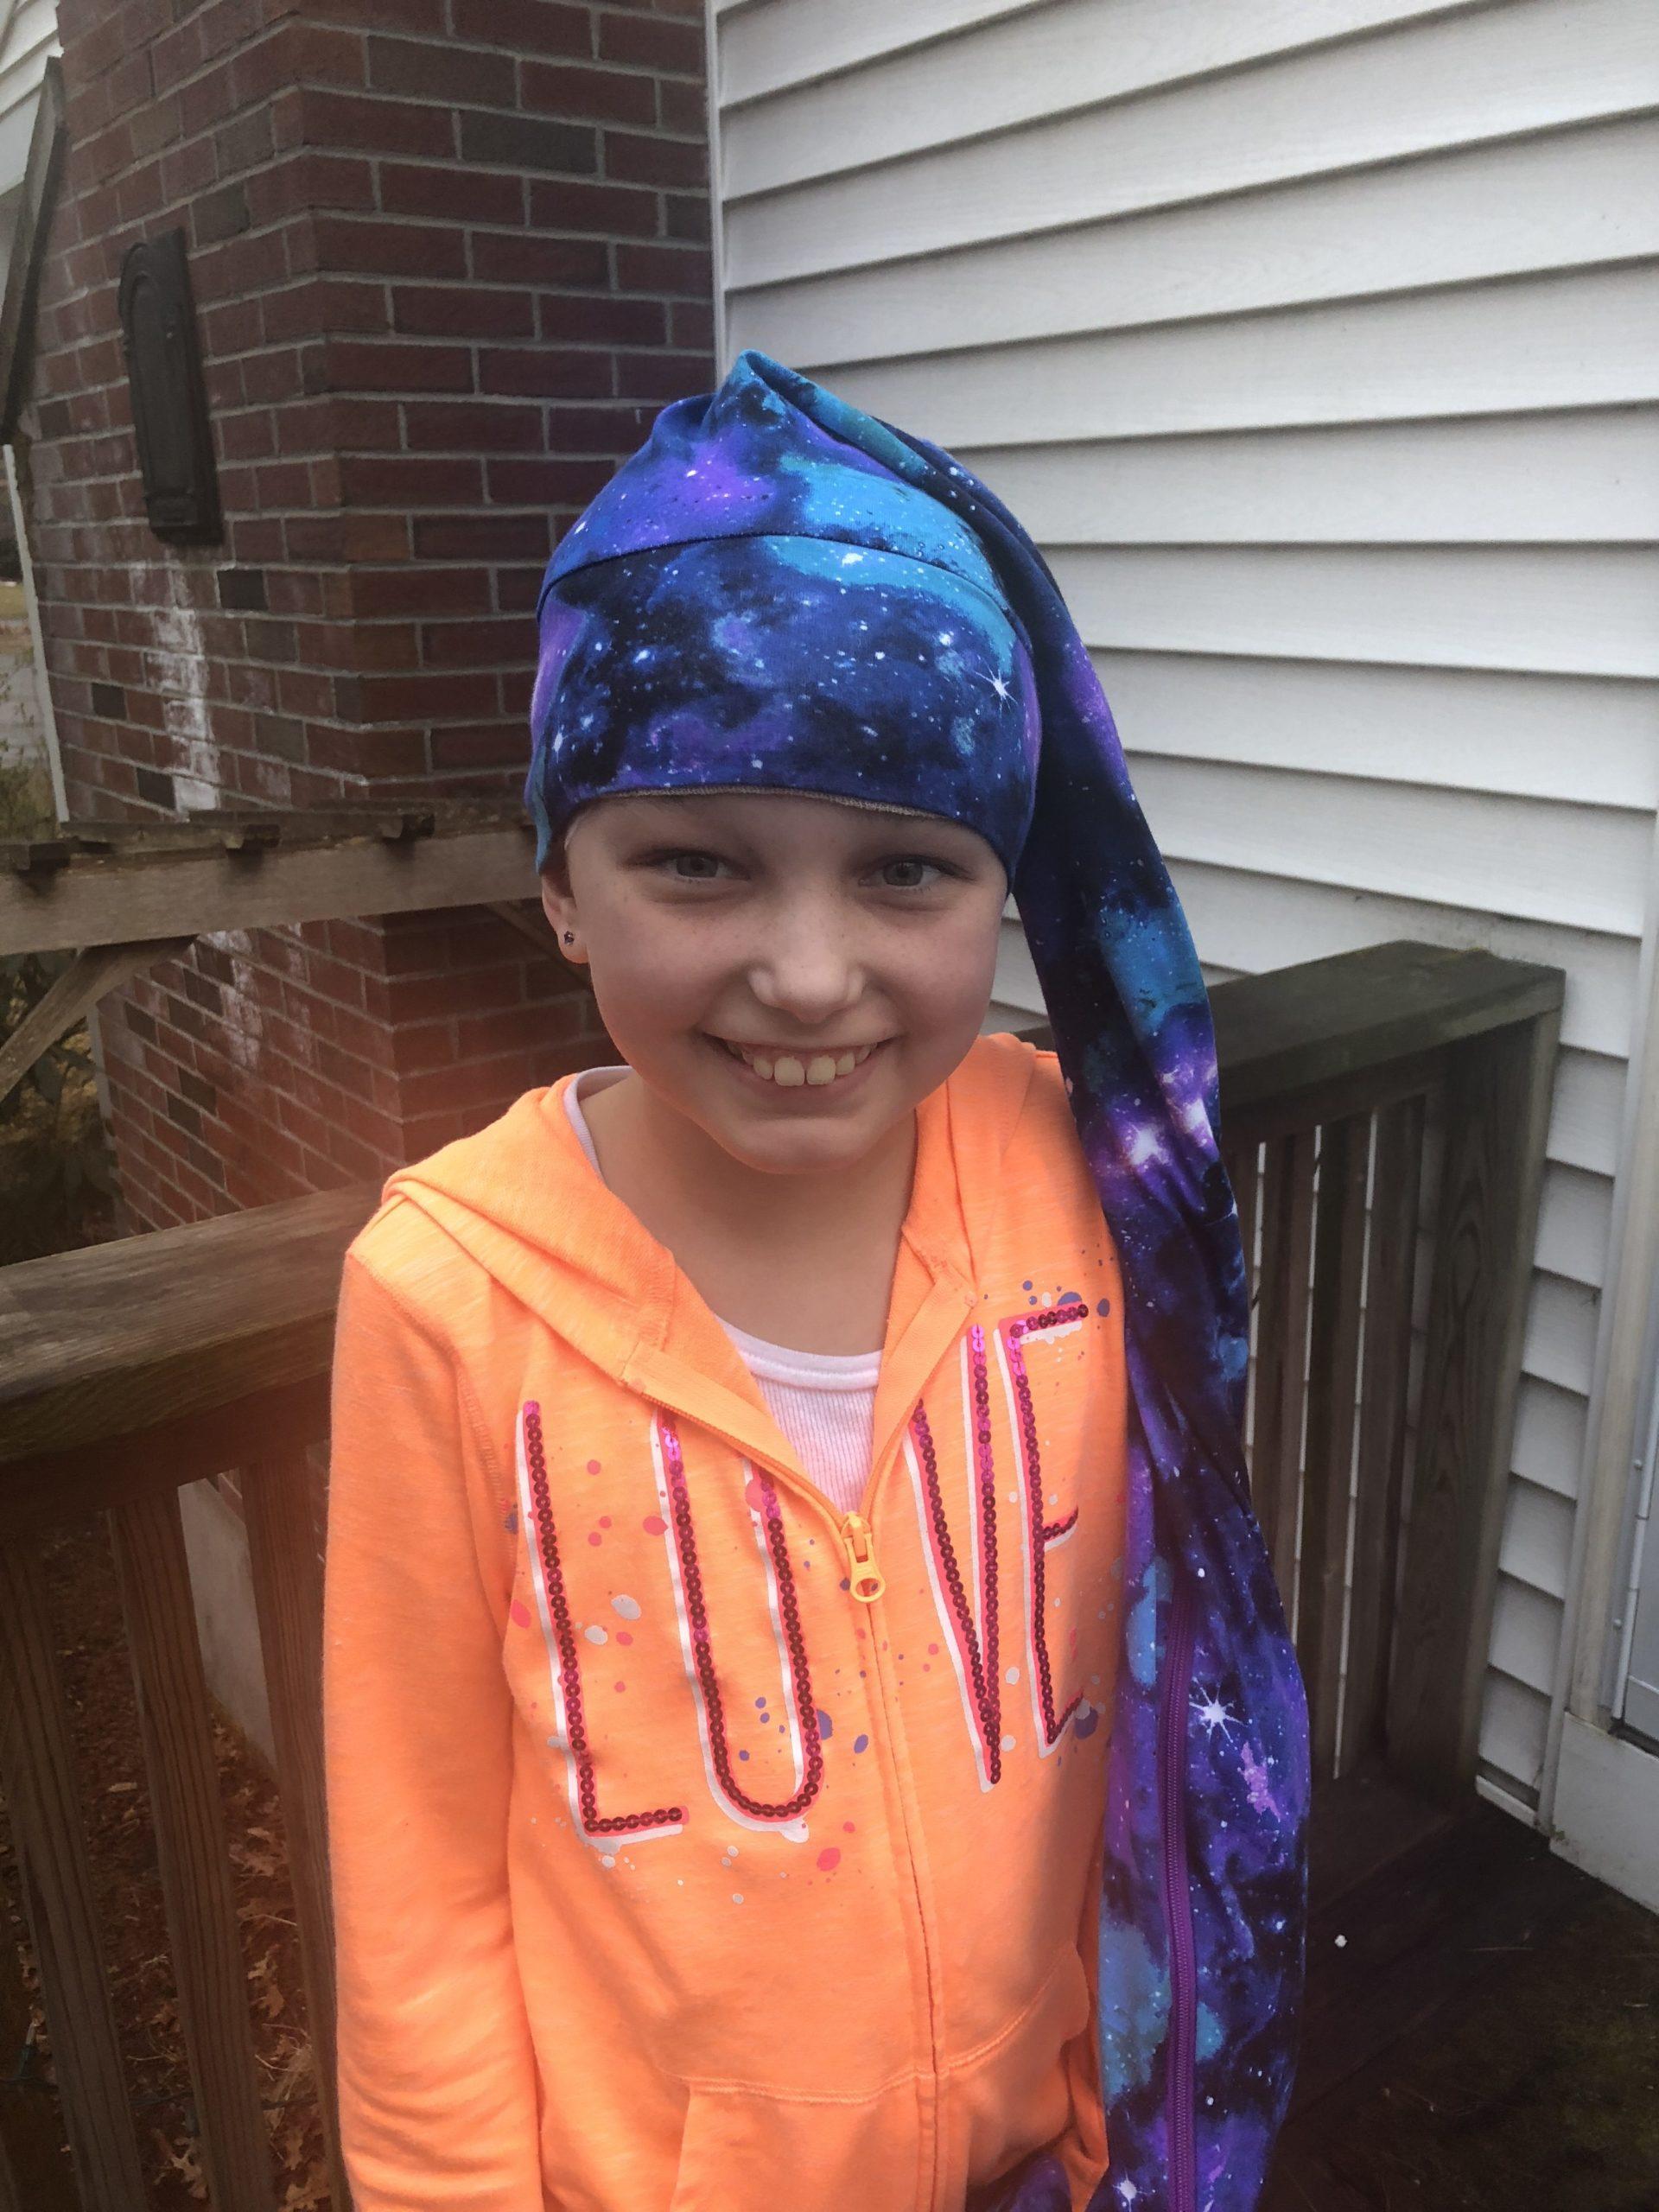 Child wearing a NillyNoggin EEG Cap during an ambulatory EEG test